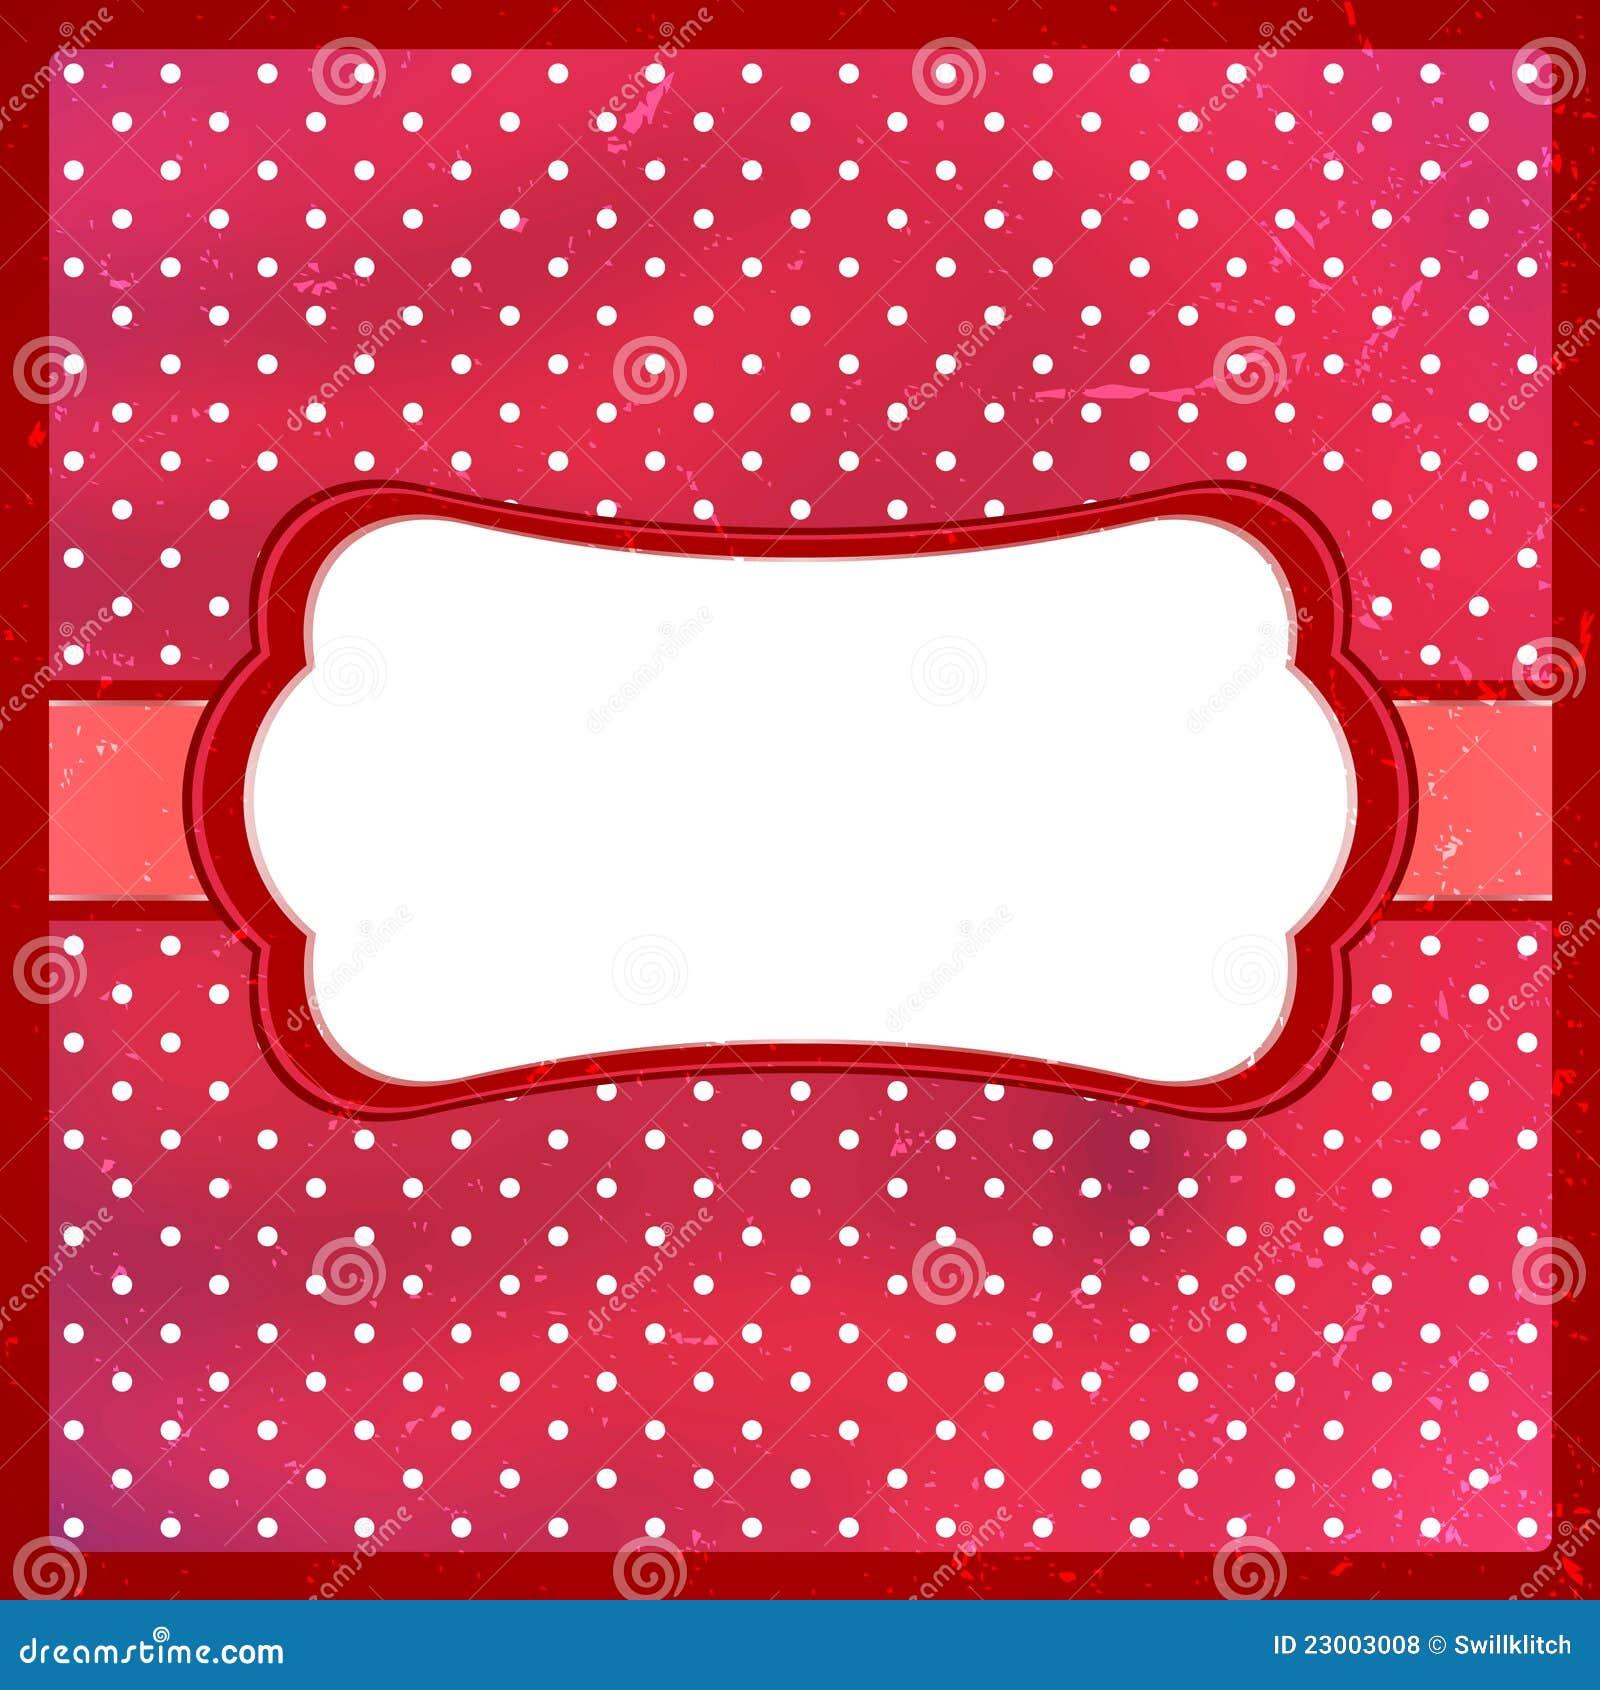 Red Polka Dot Border Clip Art